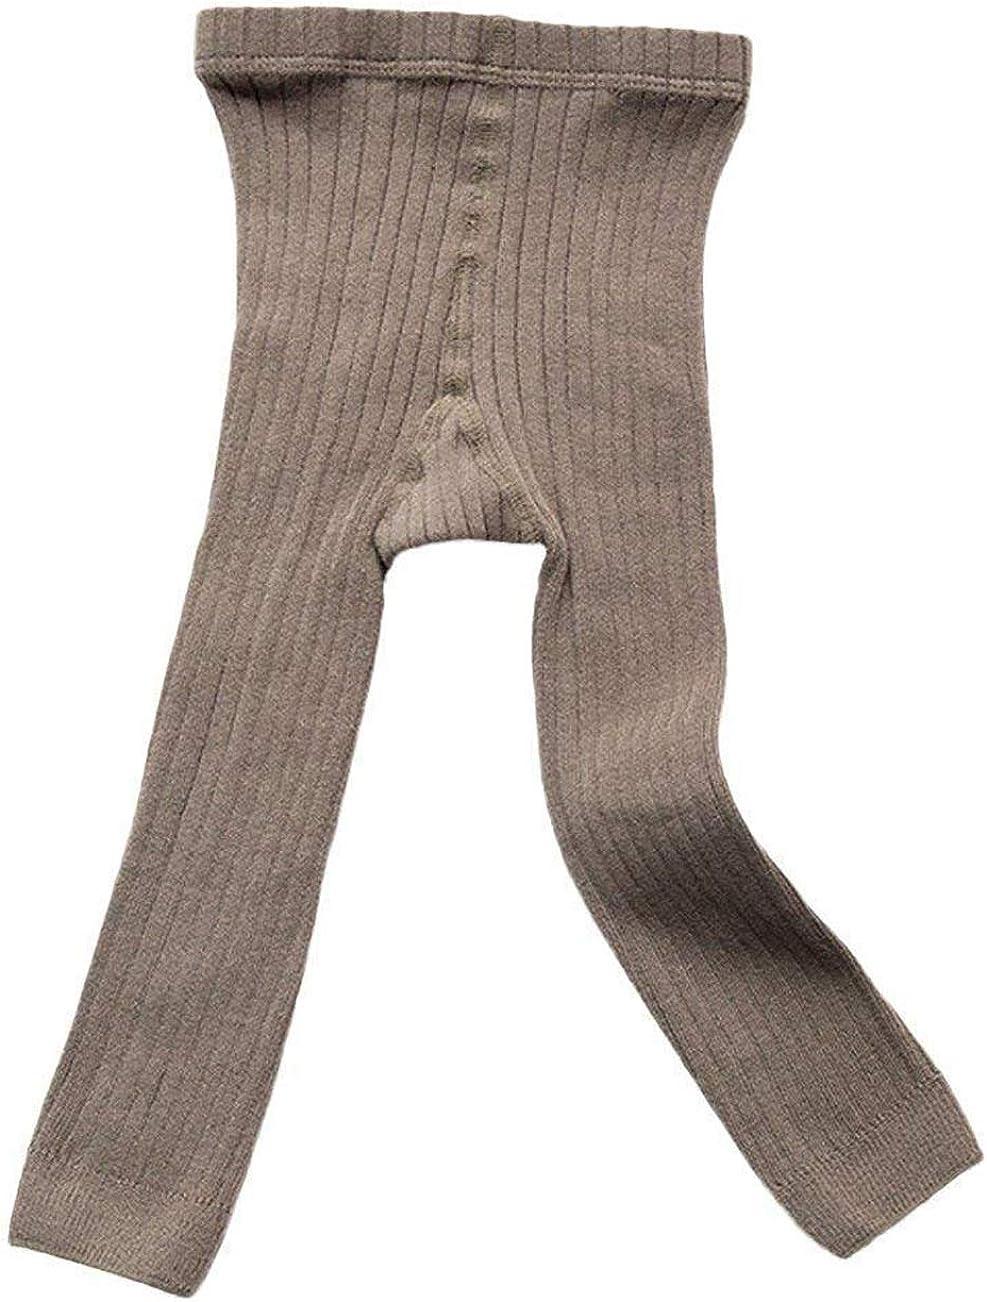 Younger star Toddler Baby Basic Ribbed Leggings Footless Tights Kids Little Girls Dress Bottom Pants